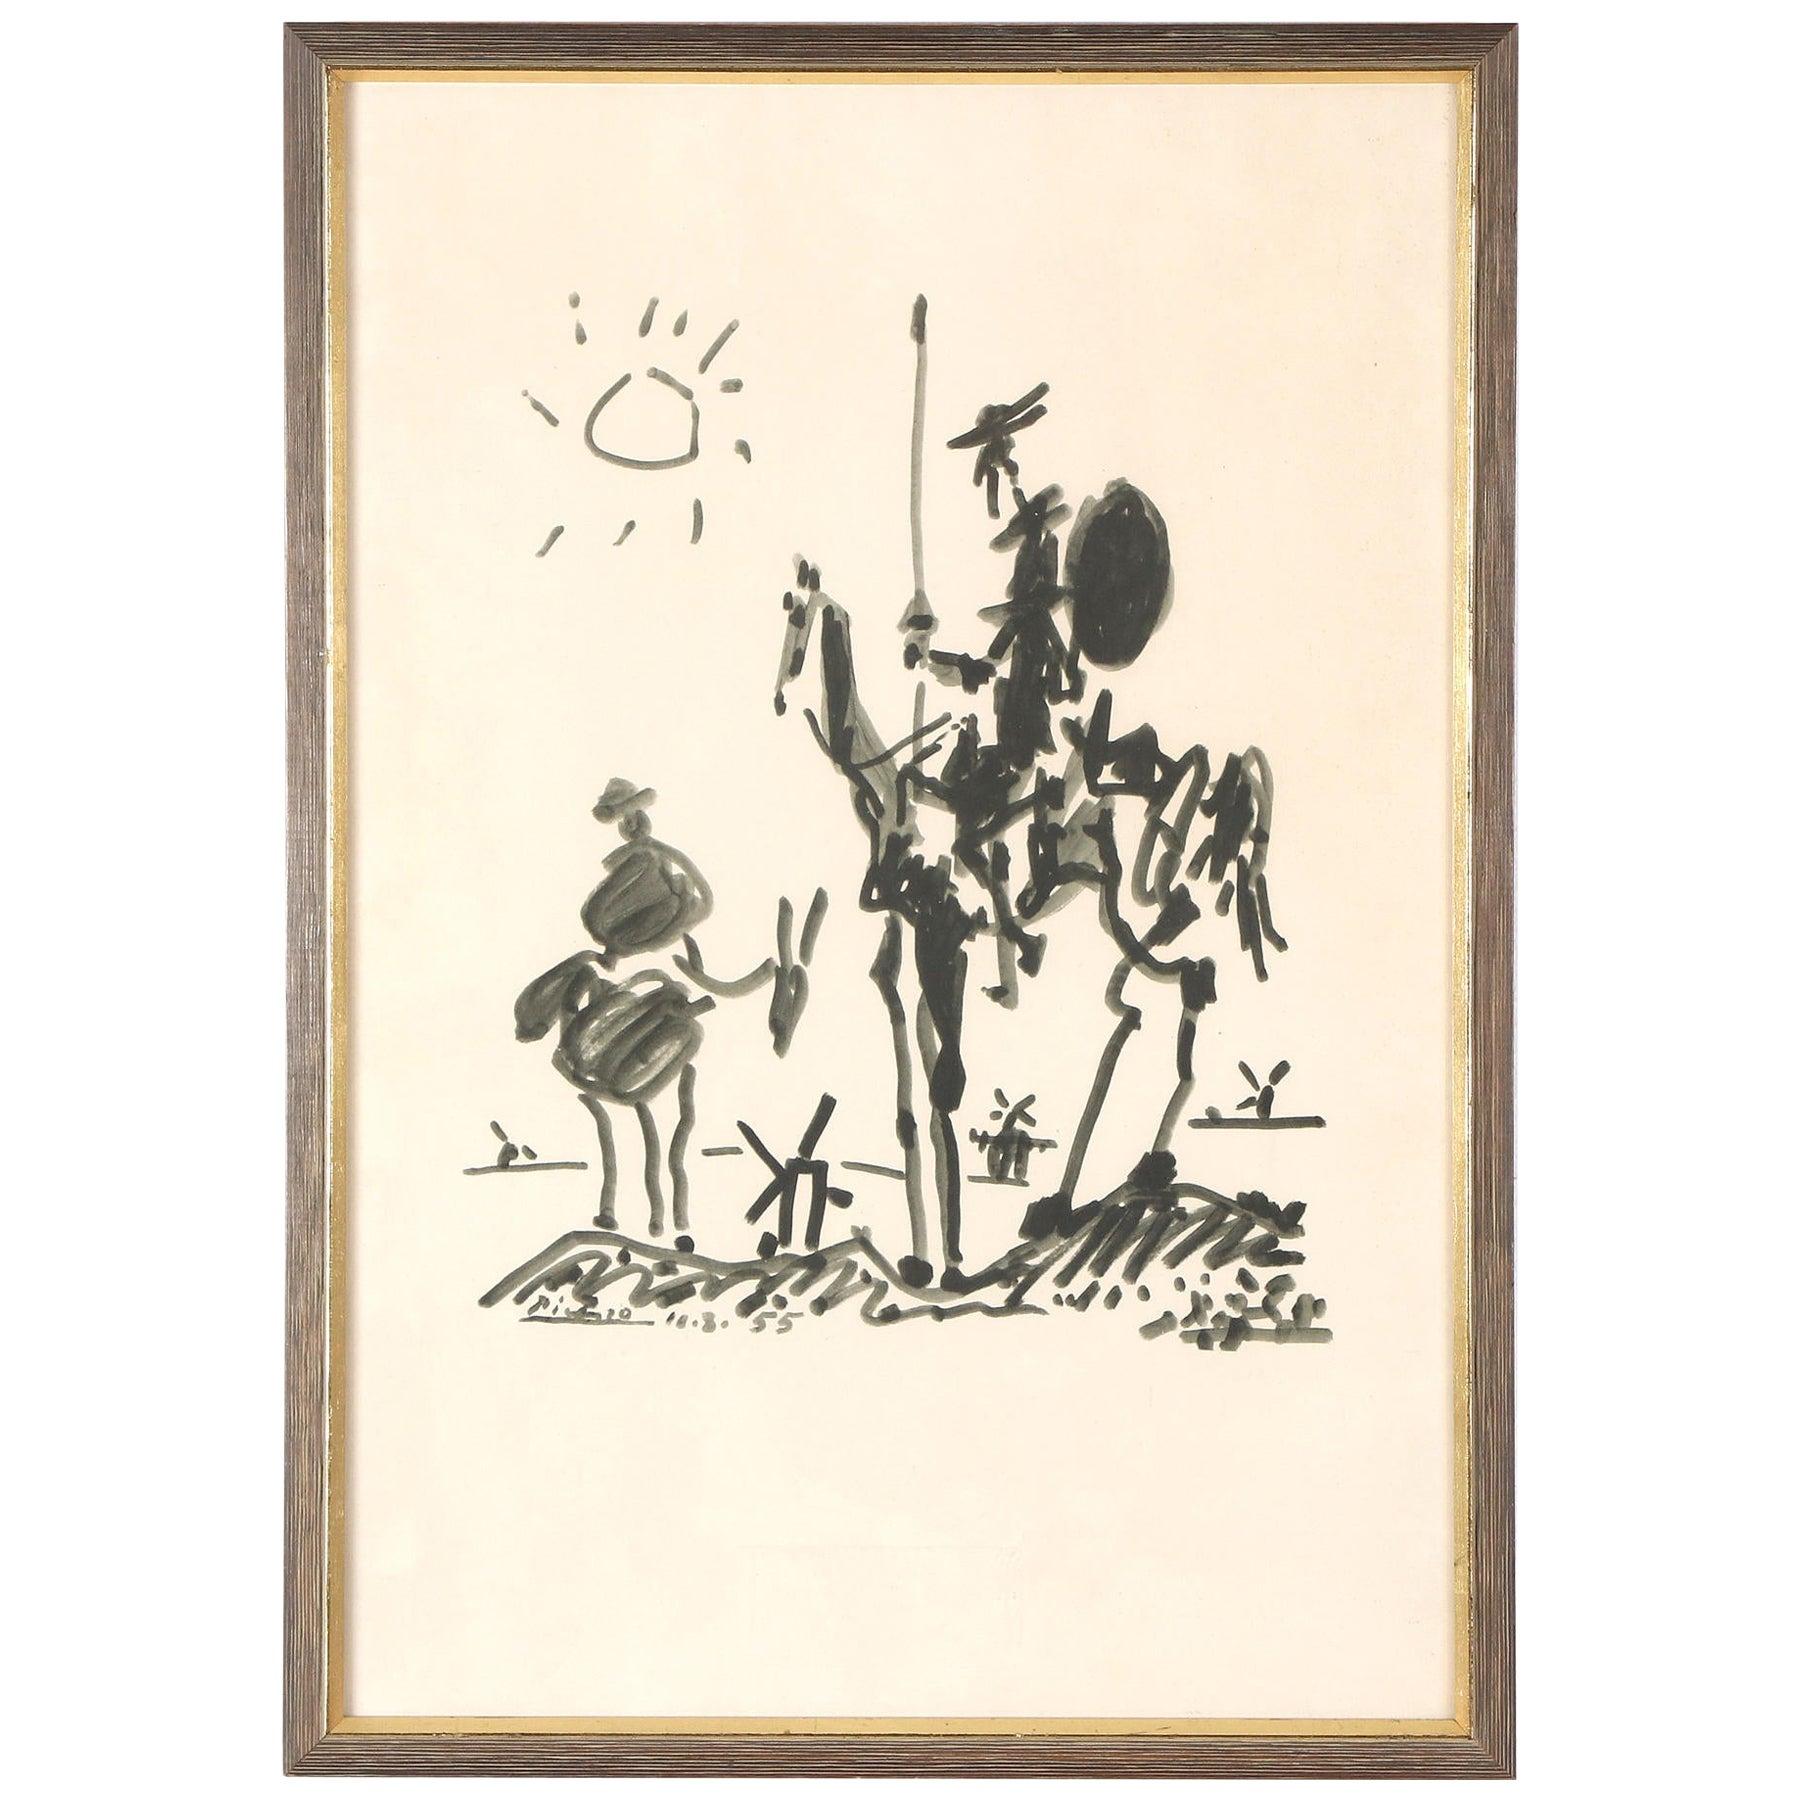 After Pablo Picasso, Don Quixote, Lithograph